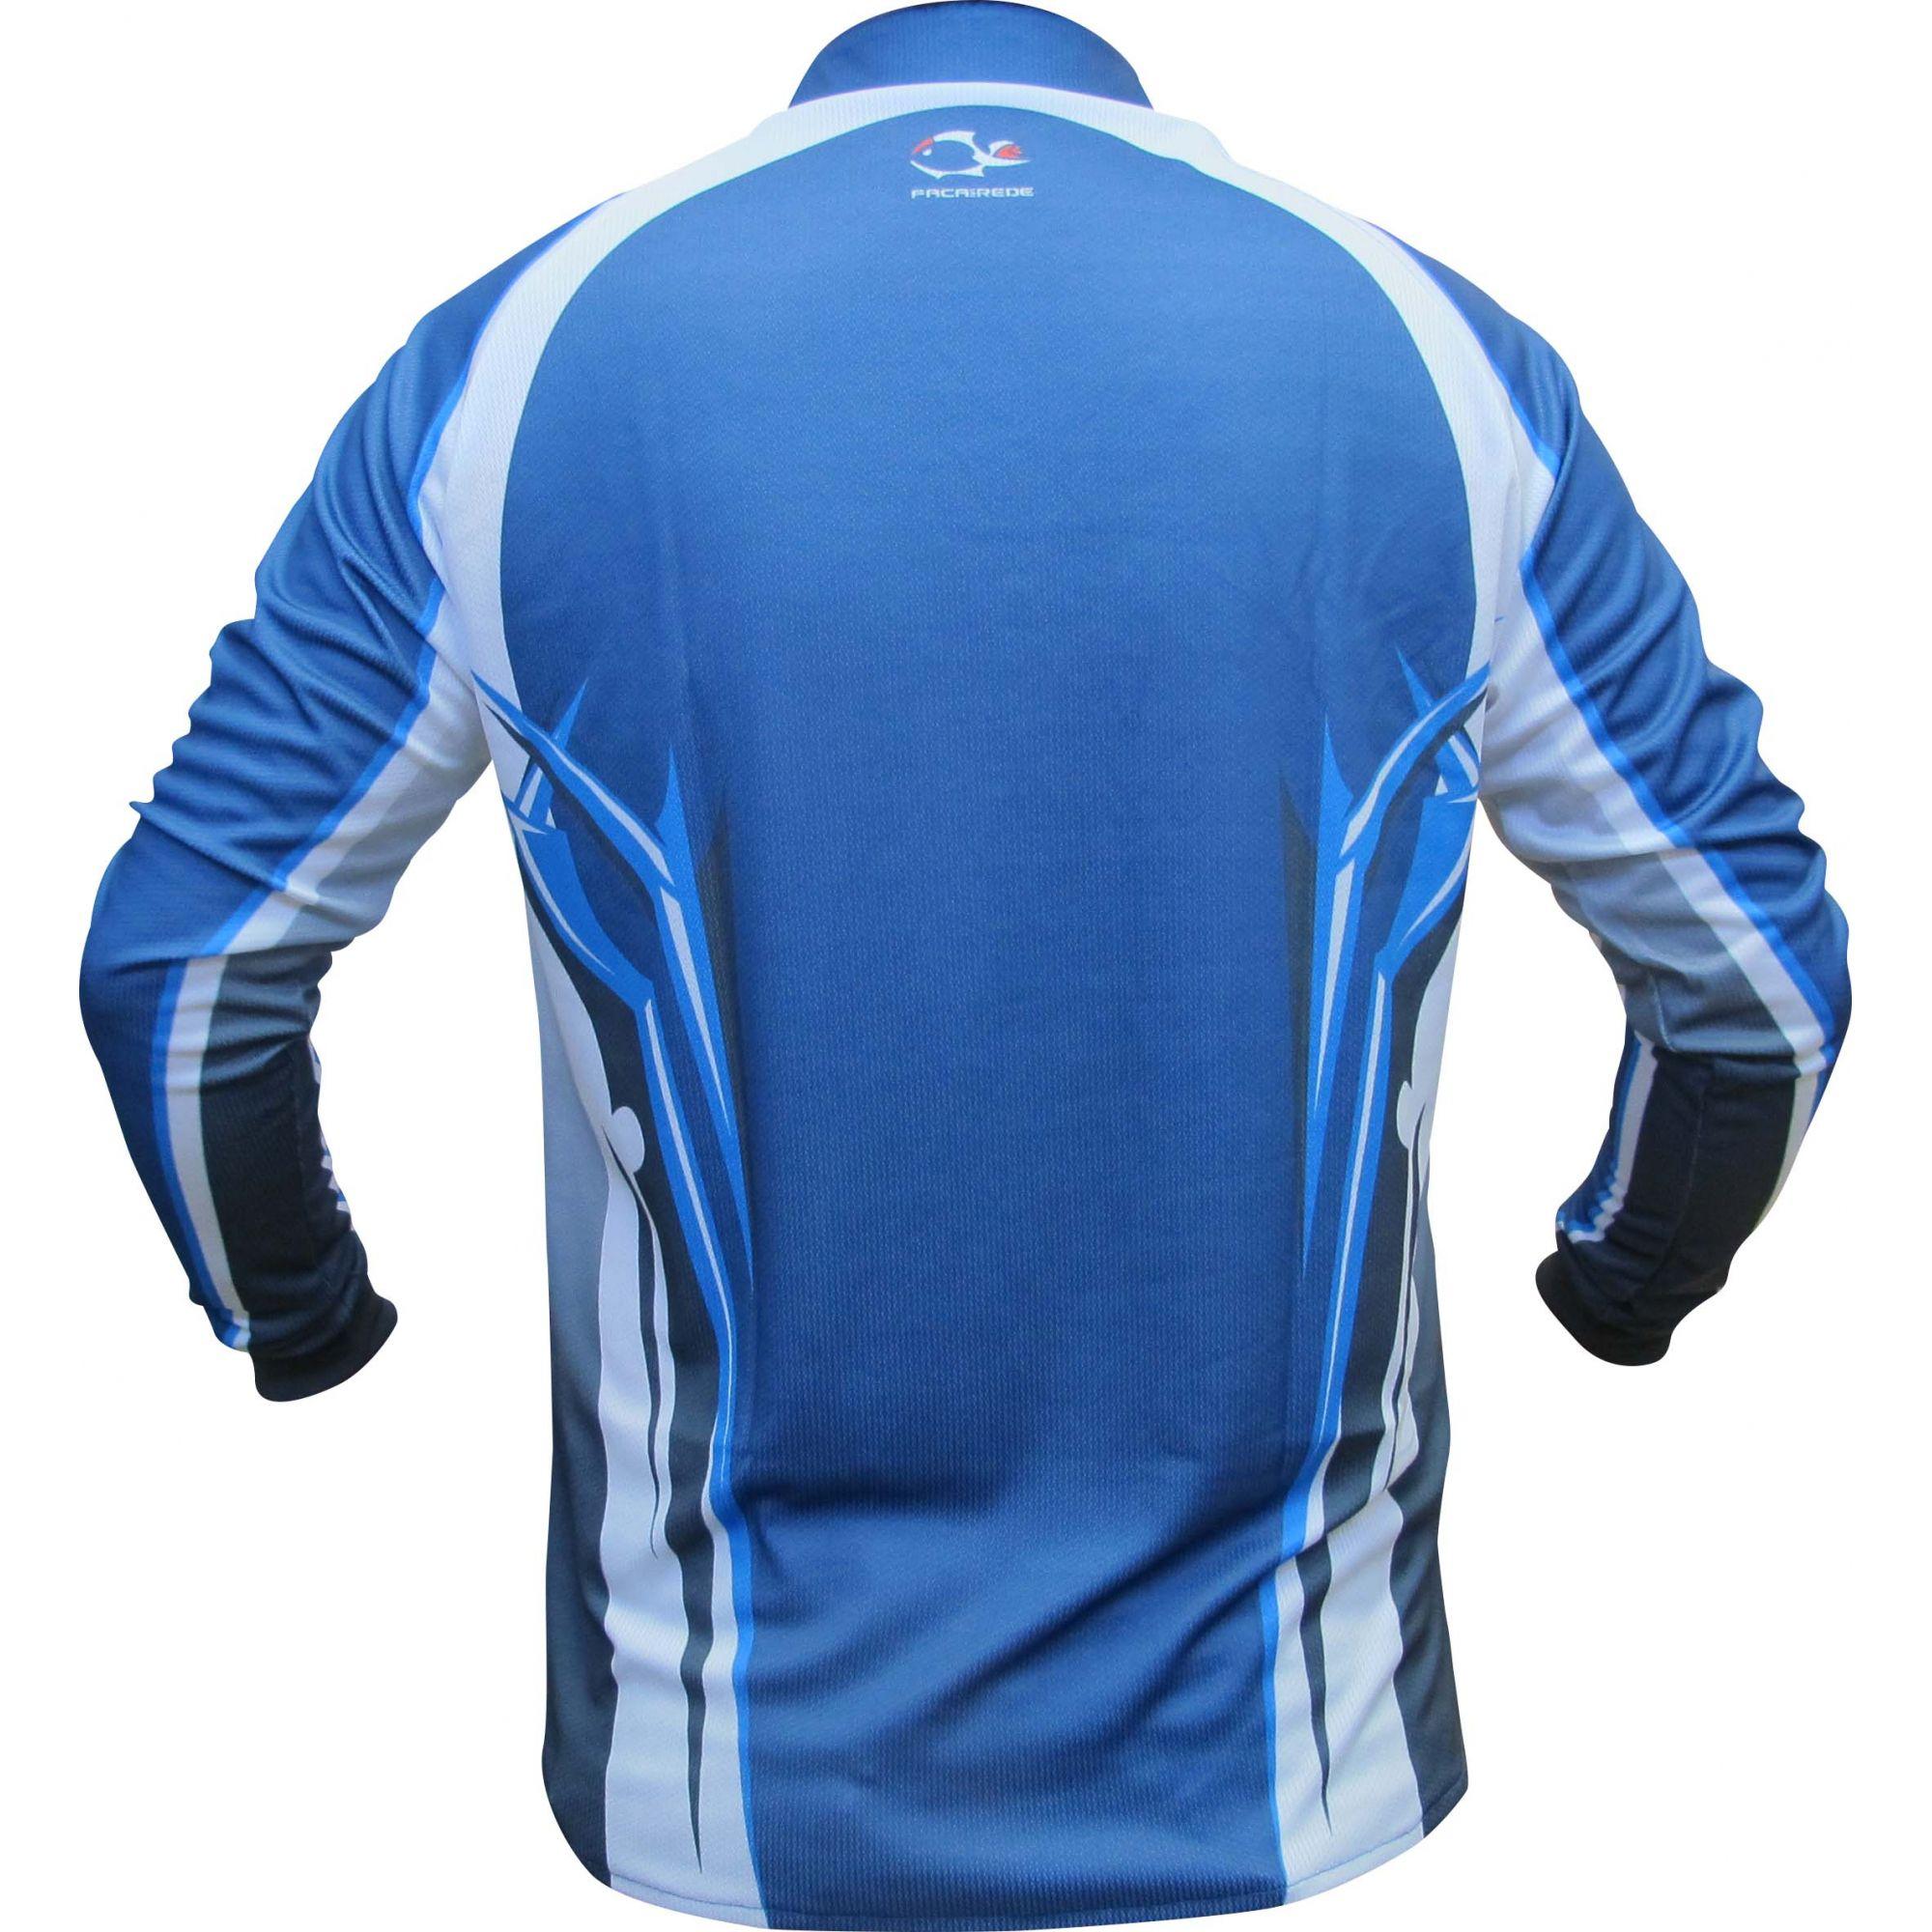 Camisa Faca na Rede Evo Clean Azul 02